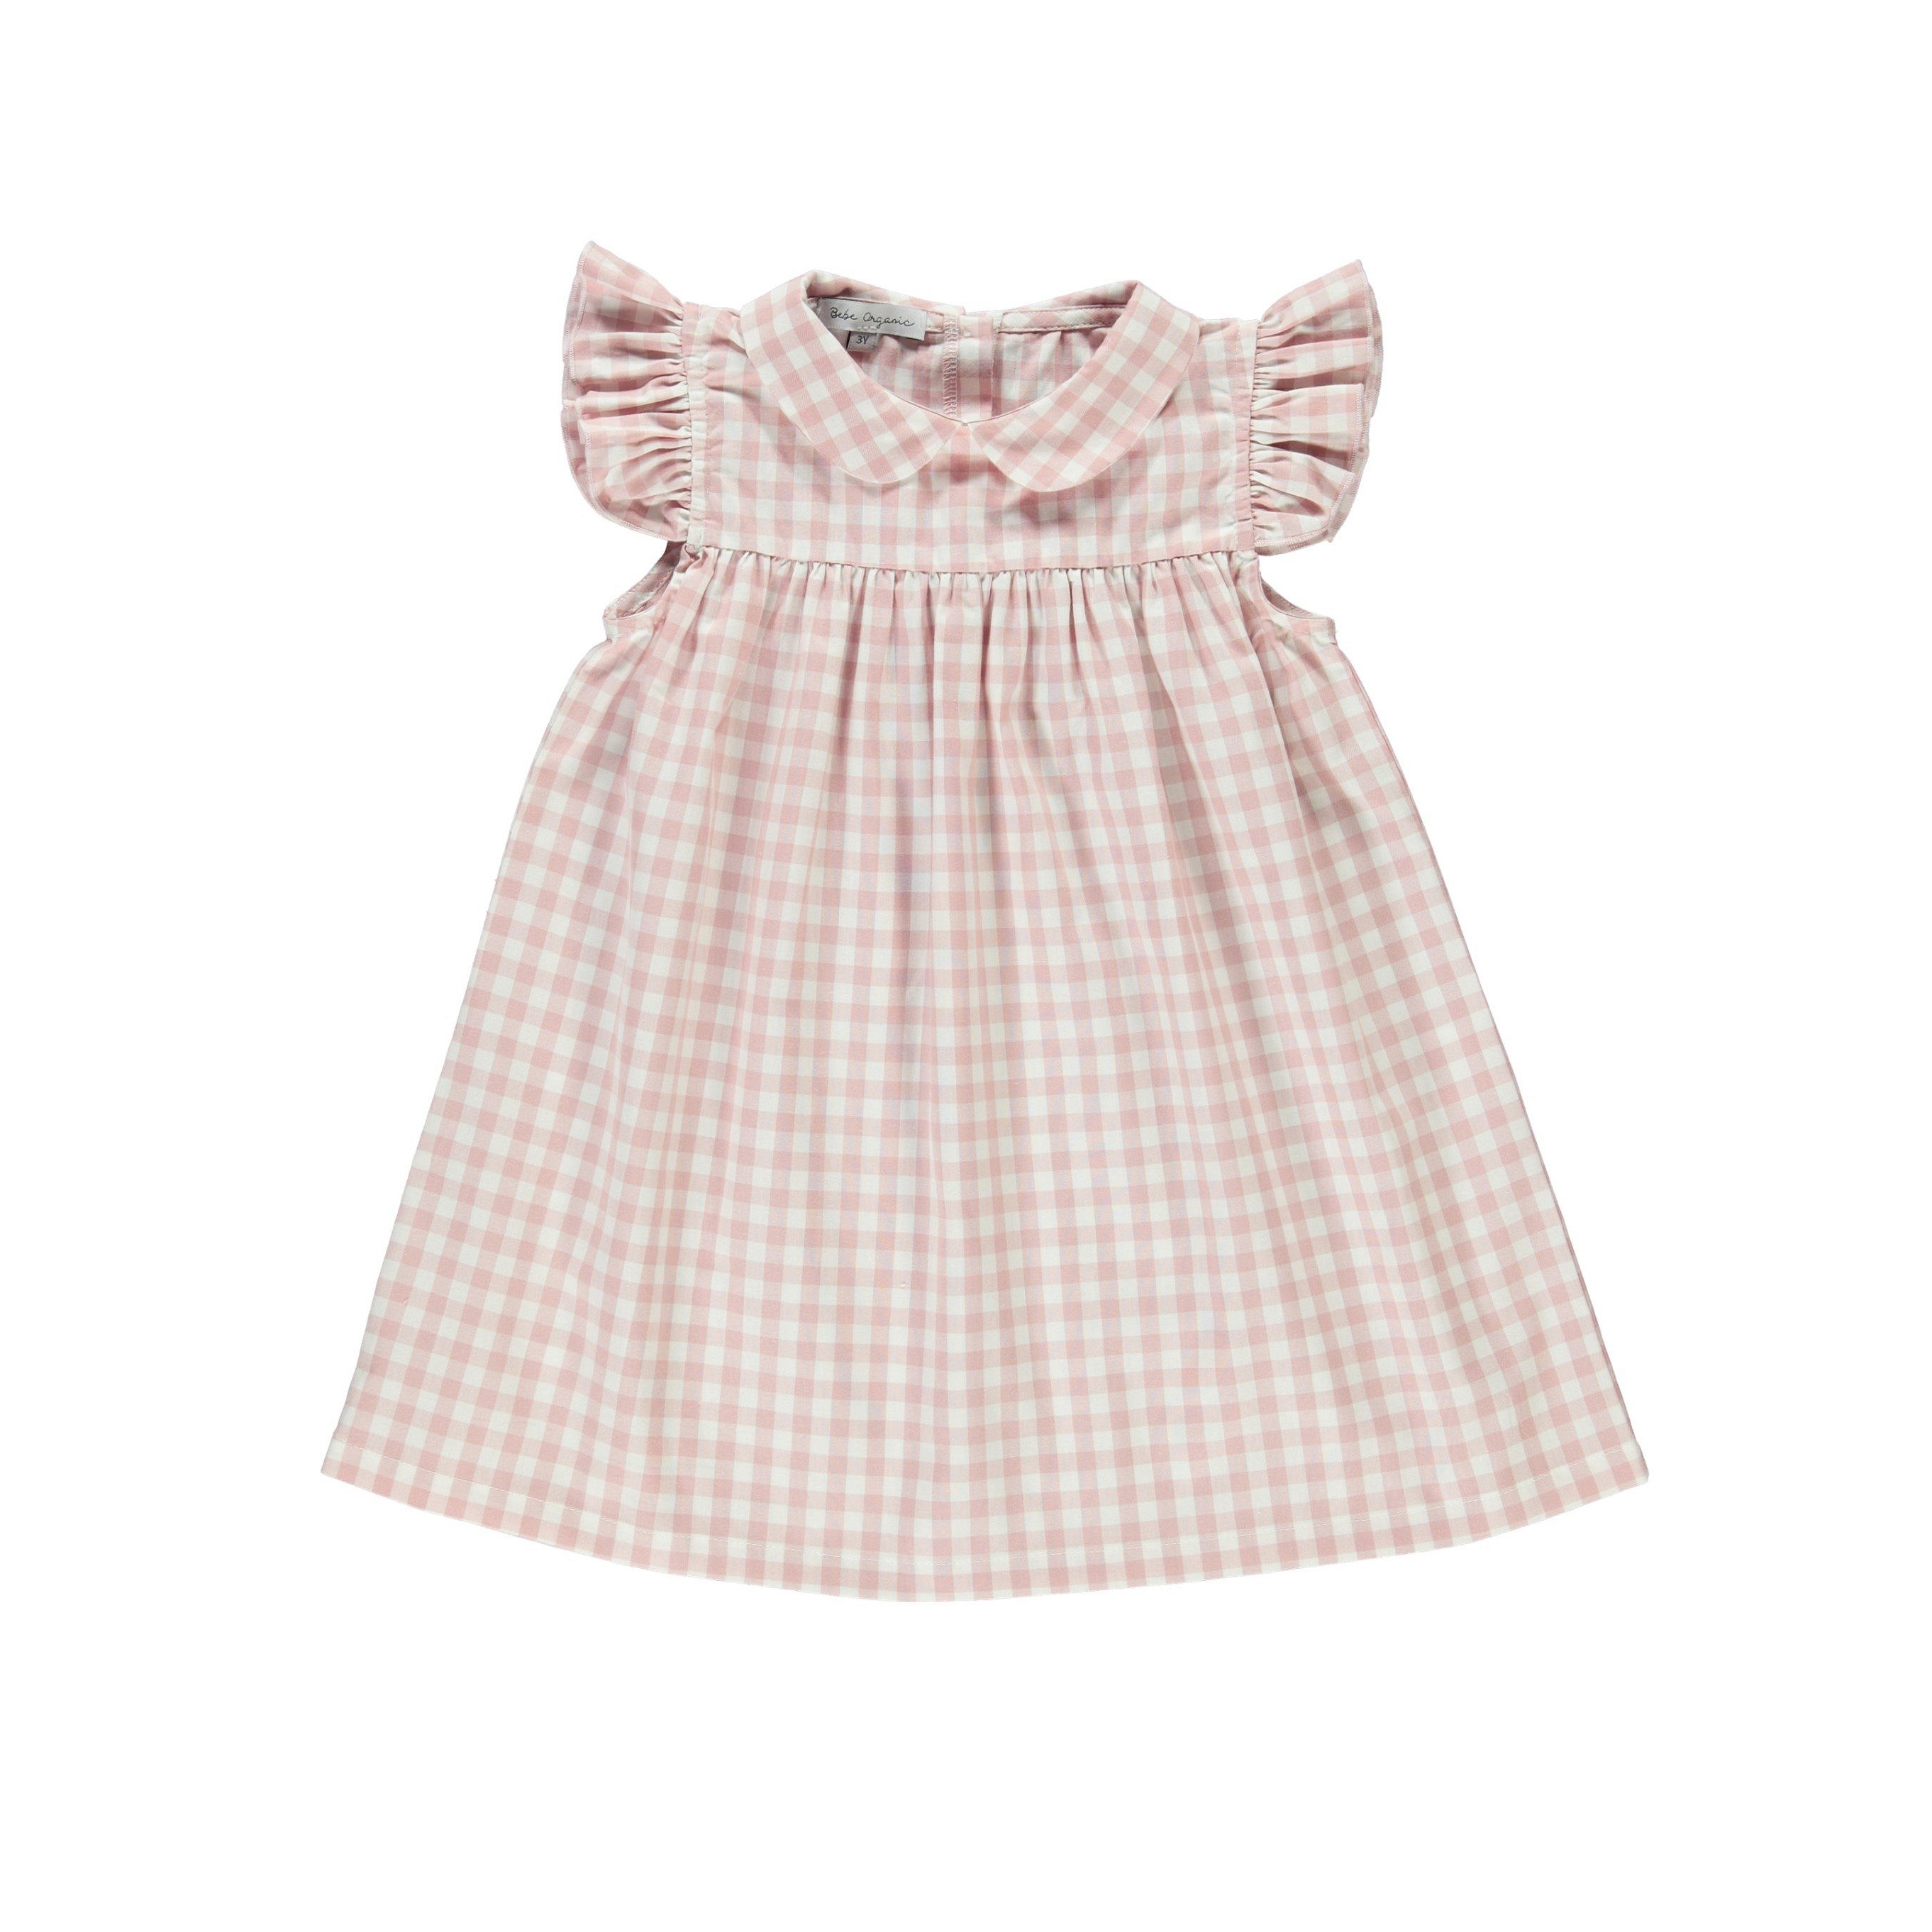 summer flower girl outfit pink checkered dress